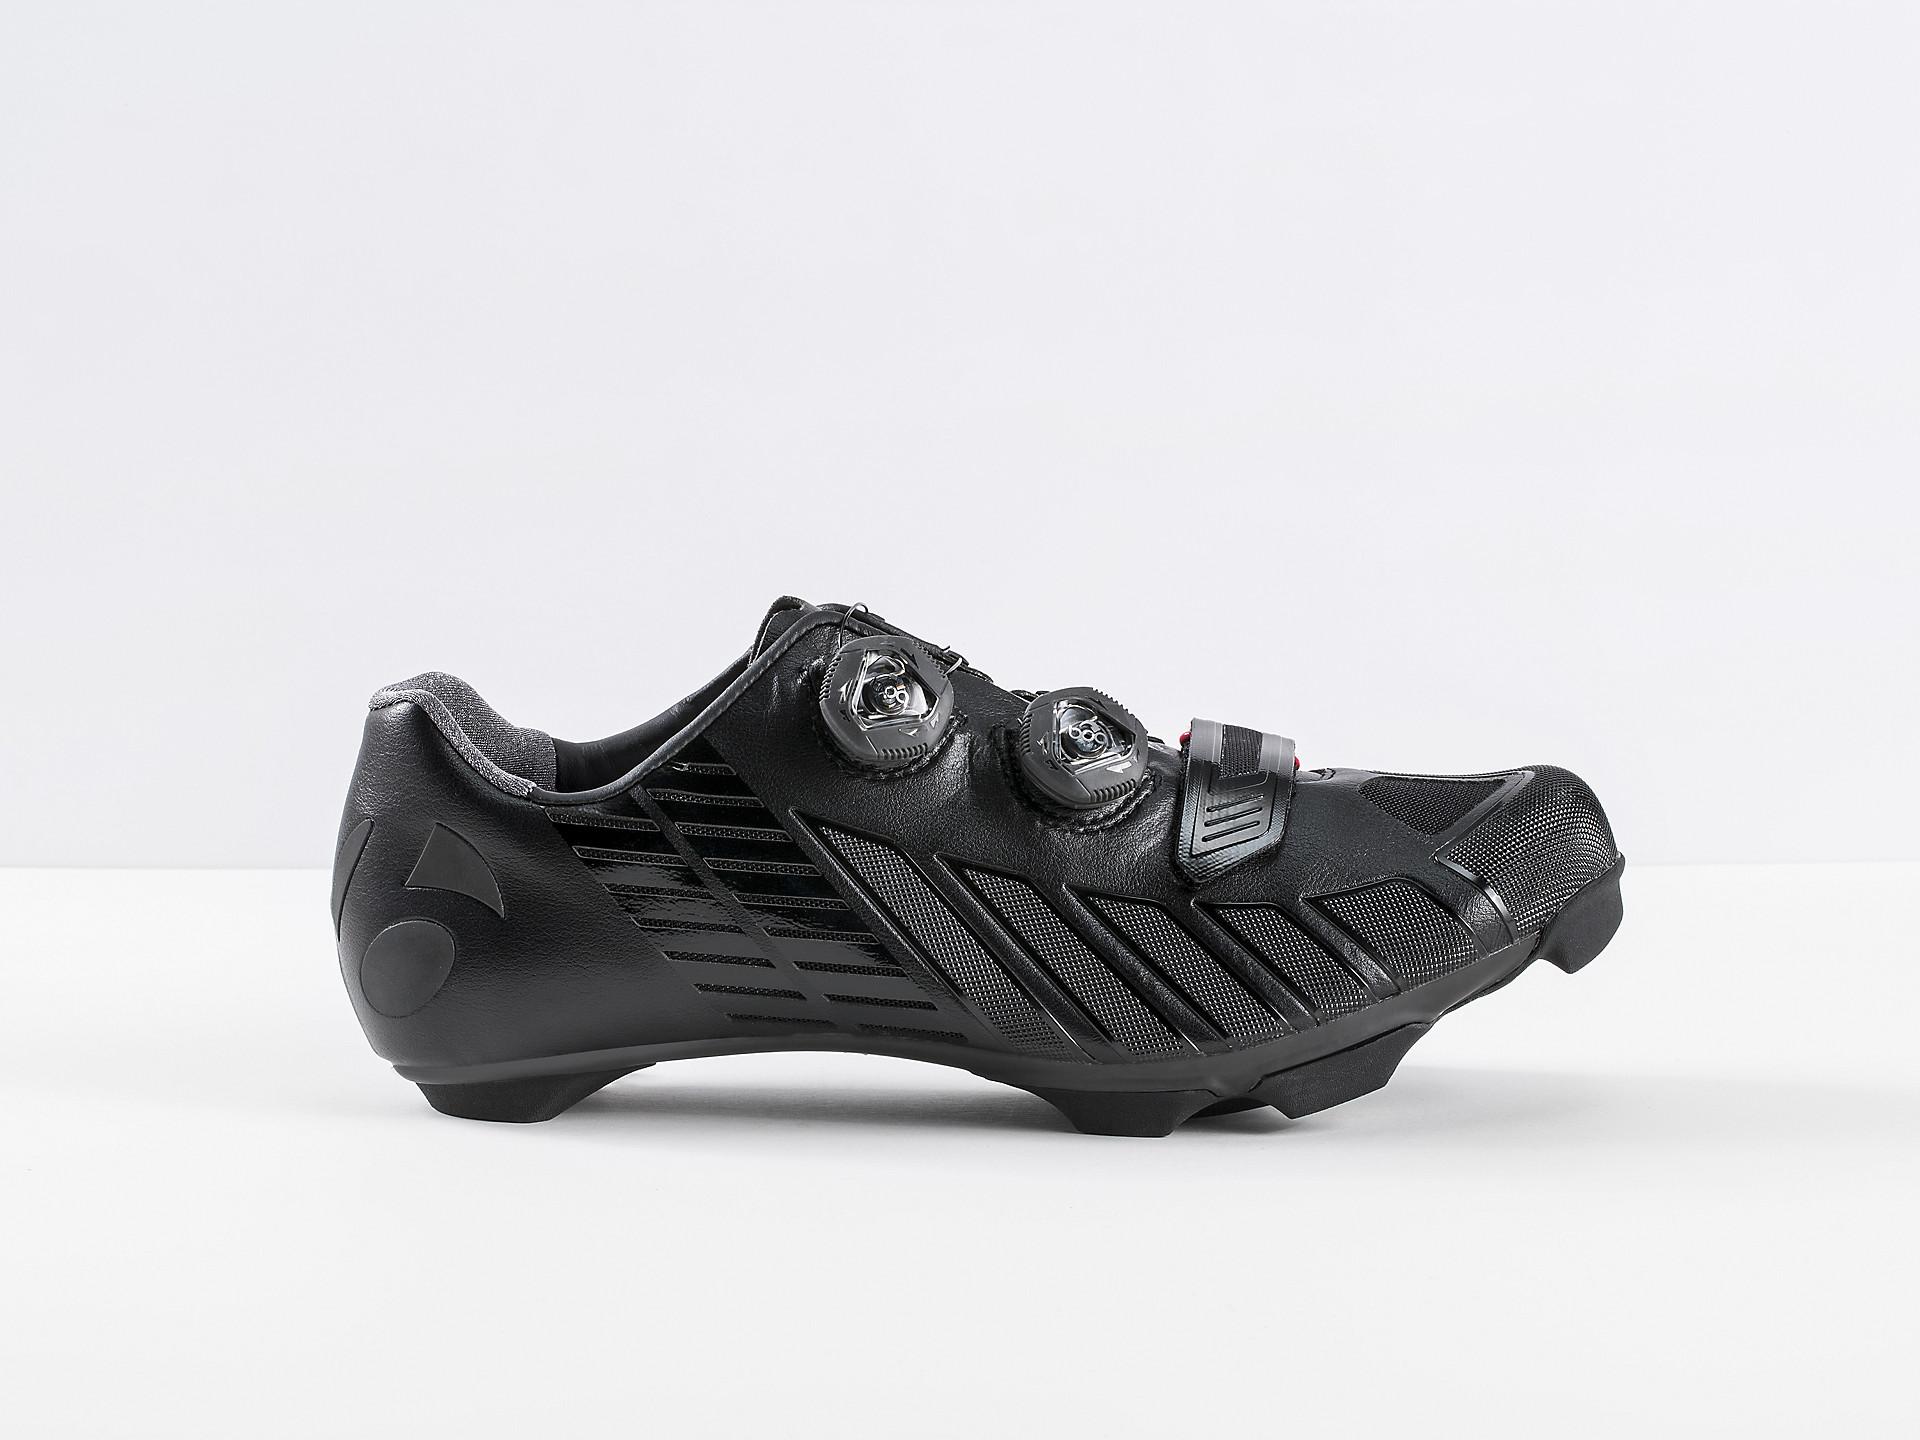 8a1bcae0d Bontrager XXX Mountain Shoe